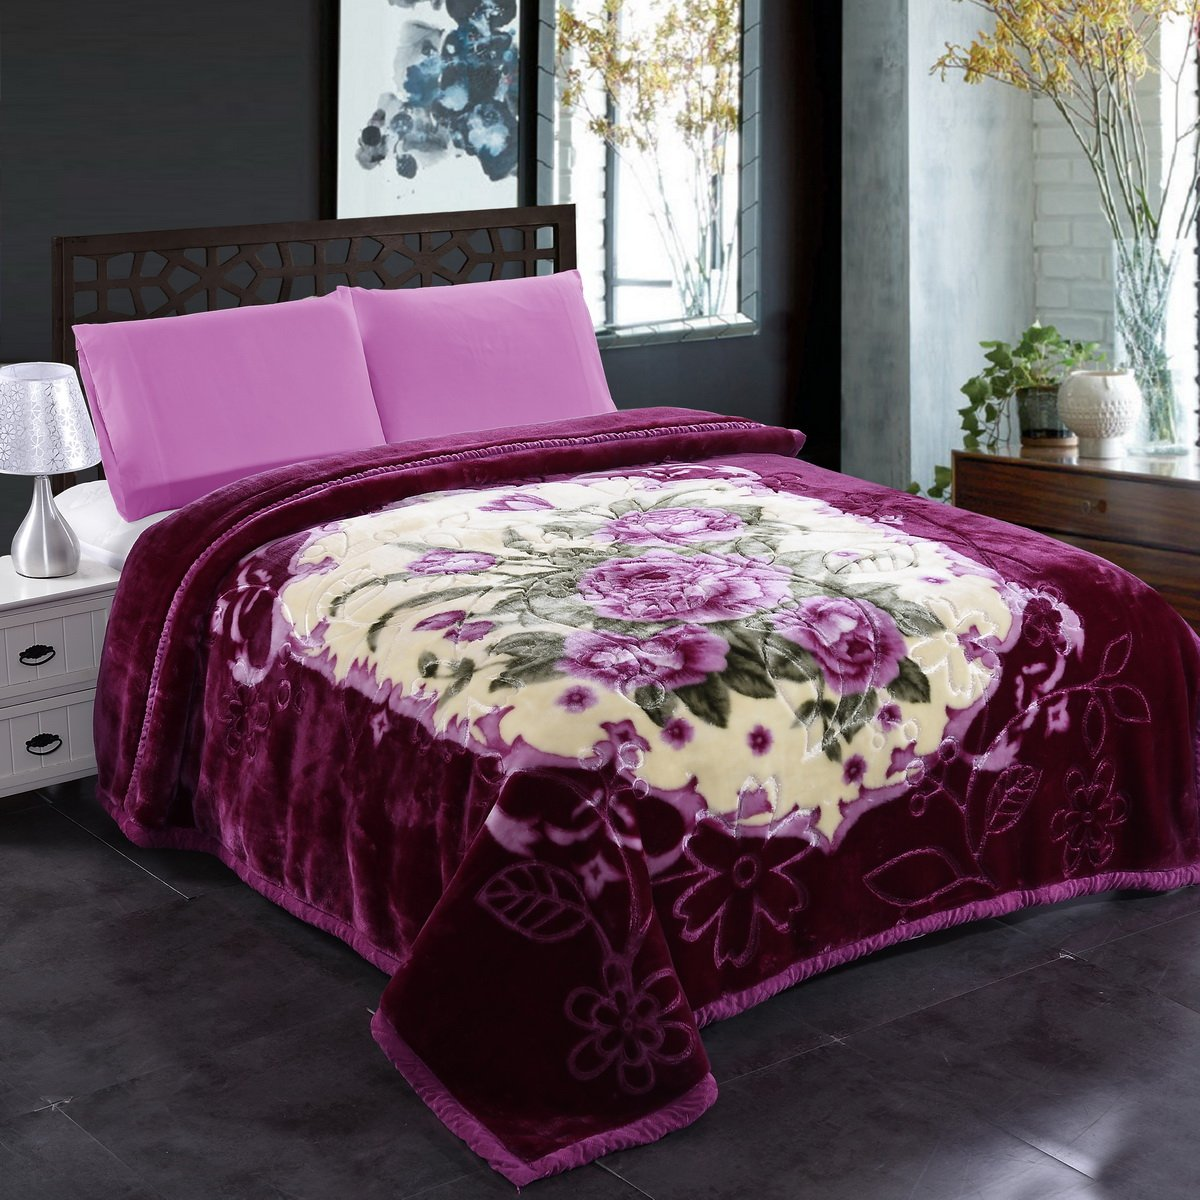 JML Plush Blankets King Size 85'' x 93'', Heavy Blankets(10 Pounds) with 2 Ply Printed - Soft Warm, Korean Style Mink Raschel Fleece Blanket, Purple Floral